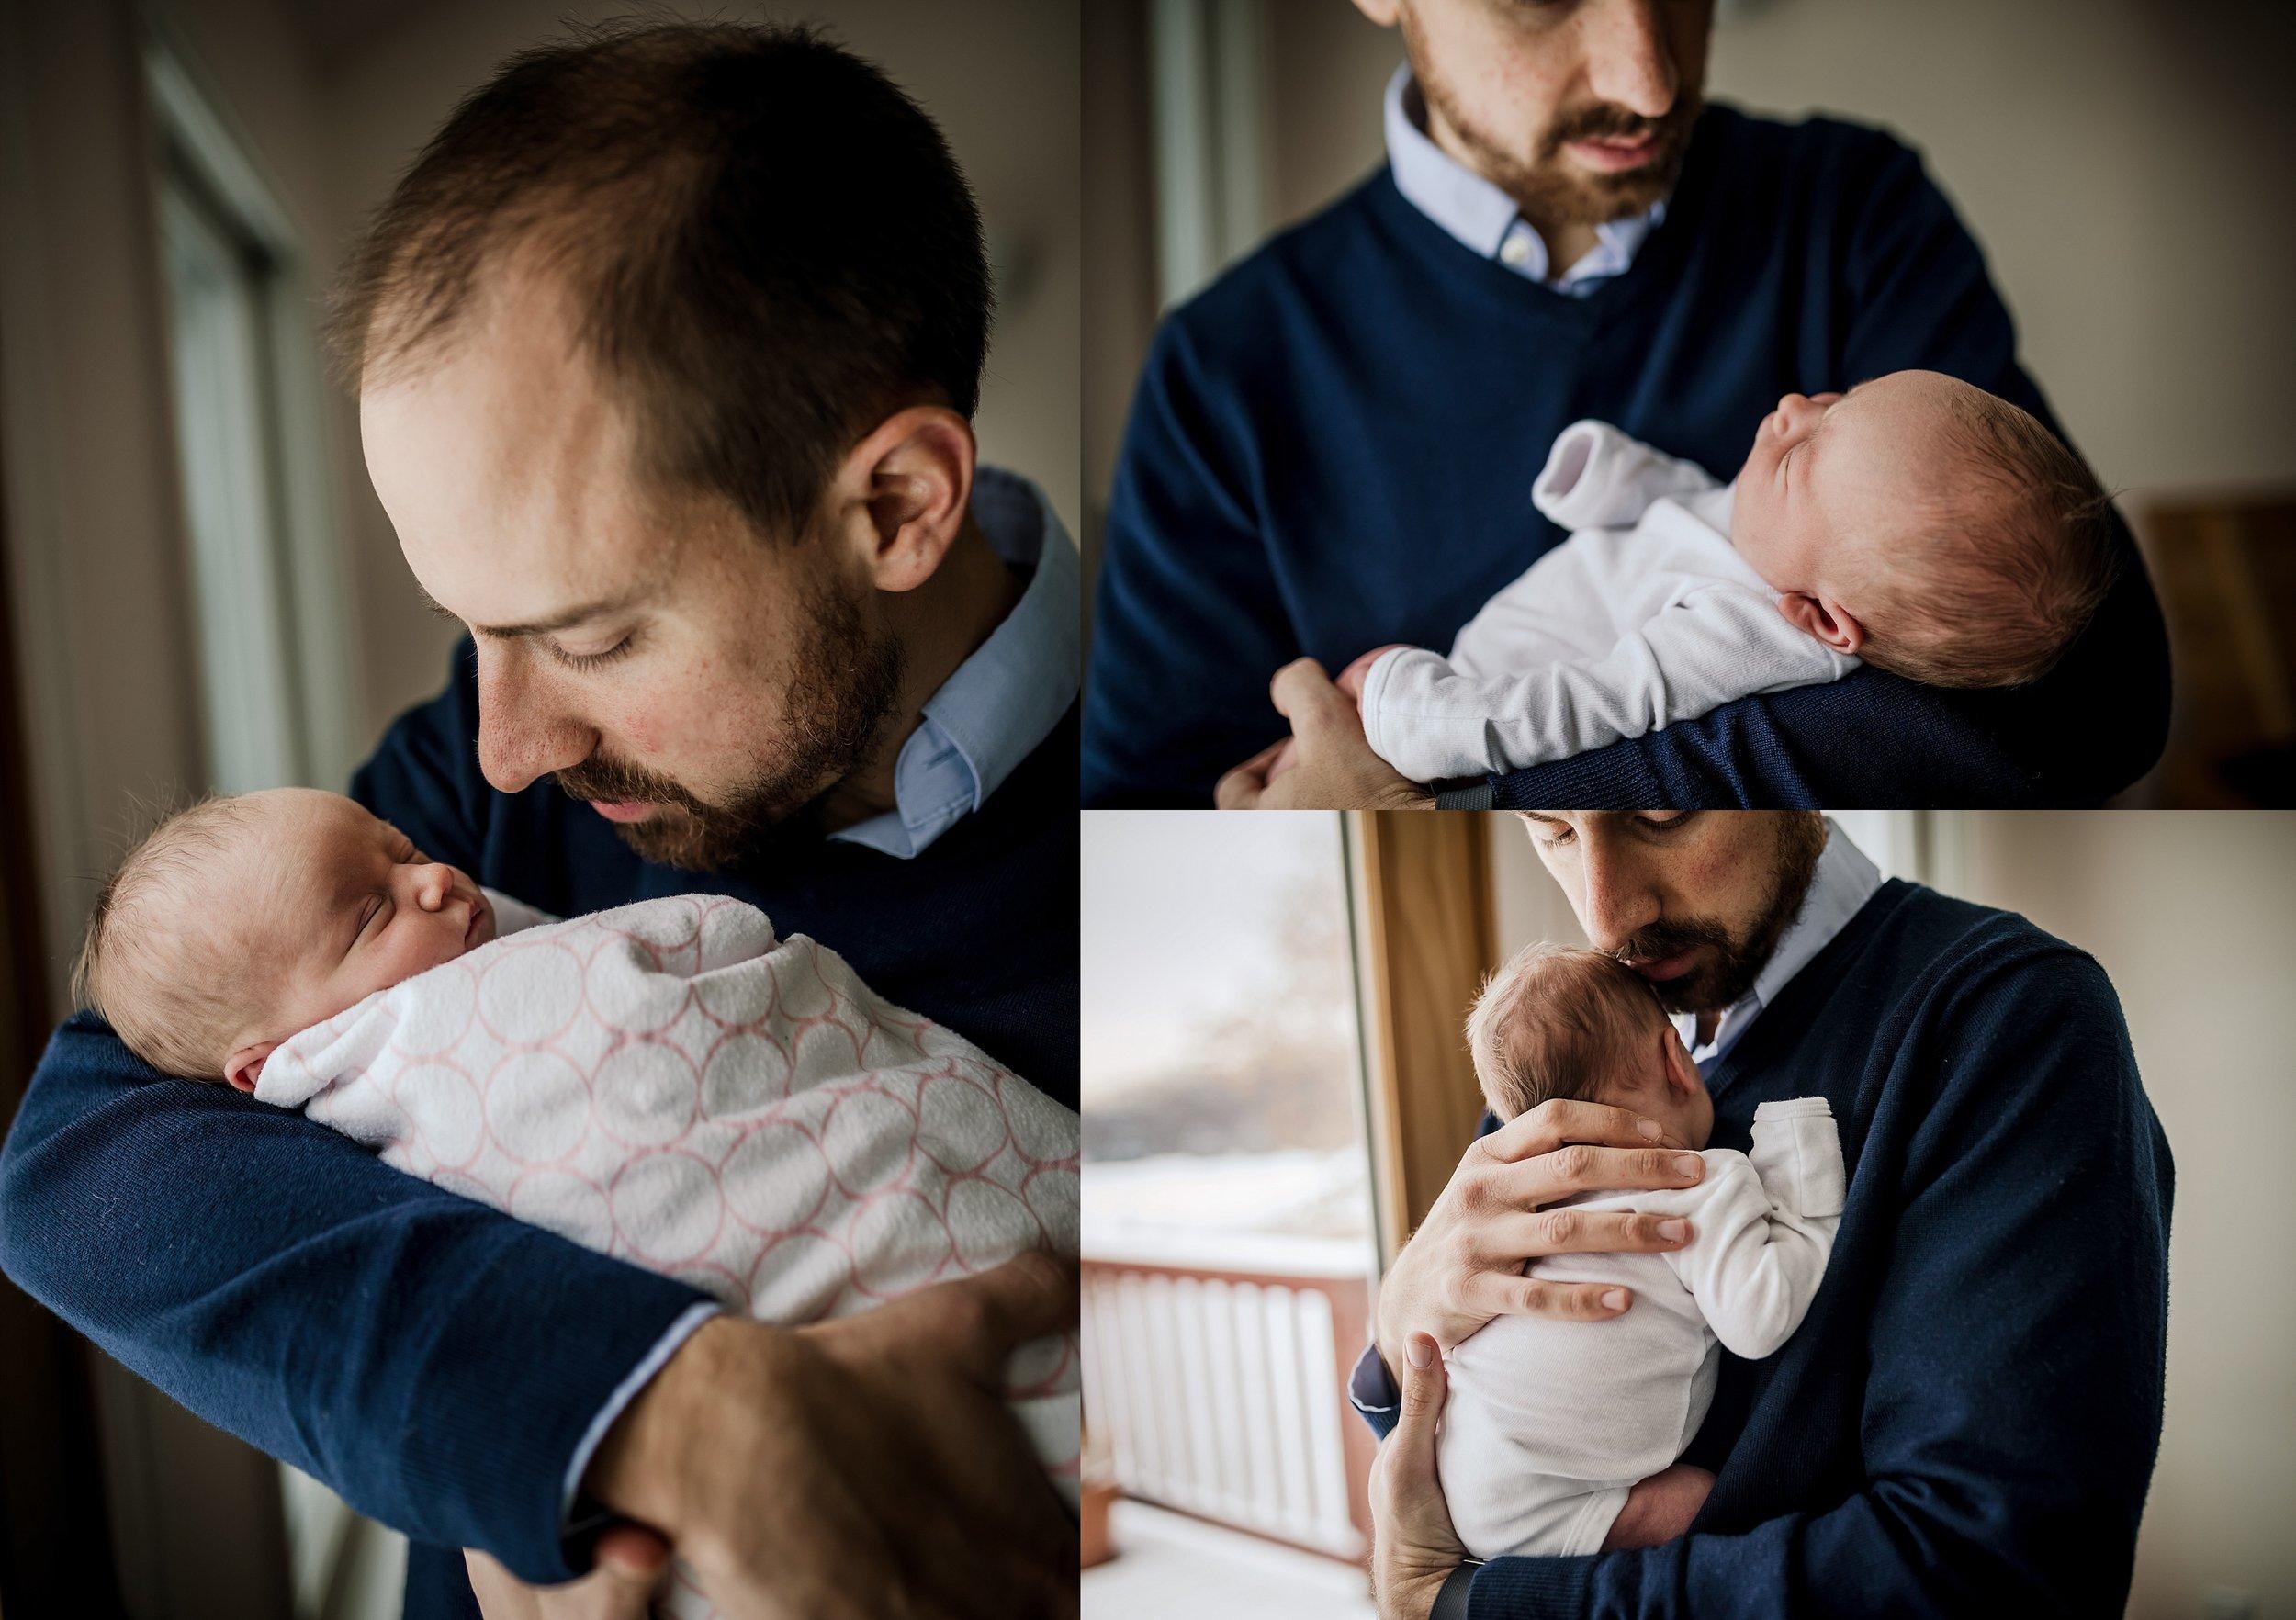 Lehigh-Valley-Documentary-Newborn-Photographer_0060.jpg